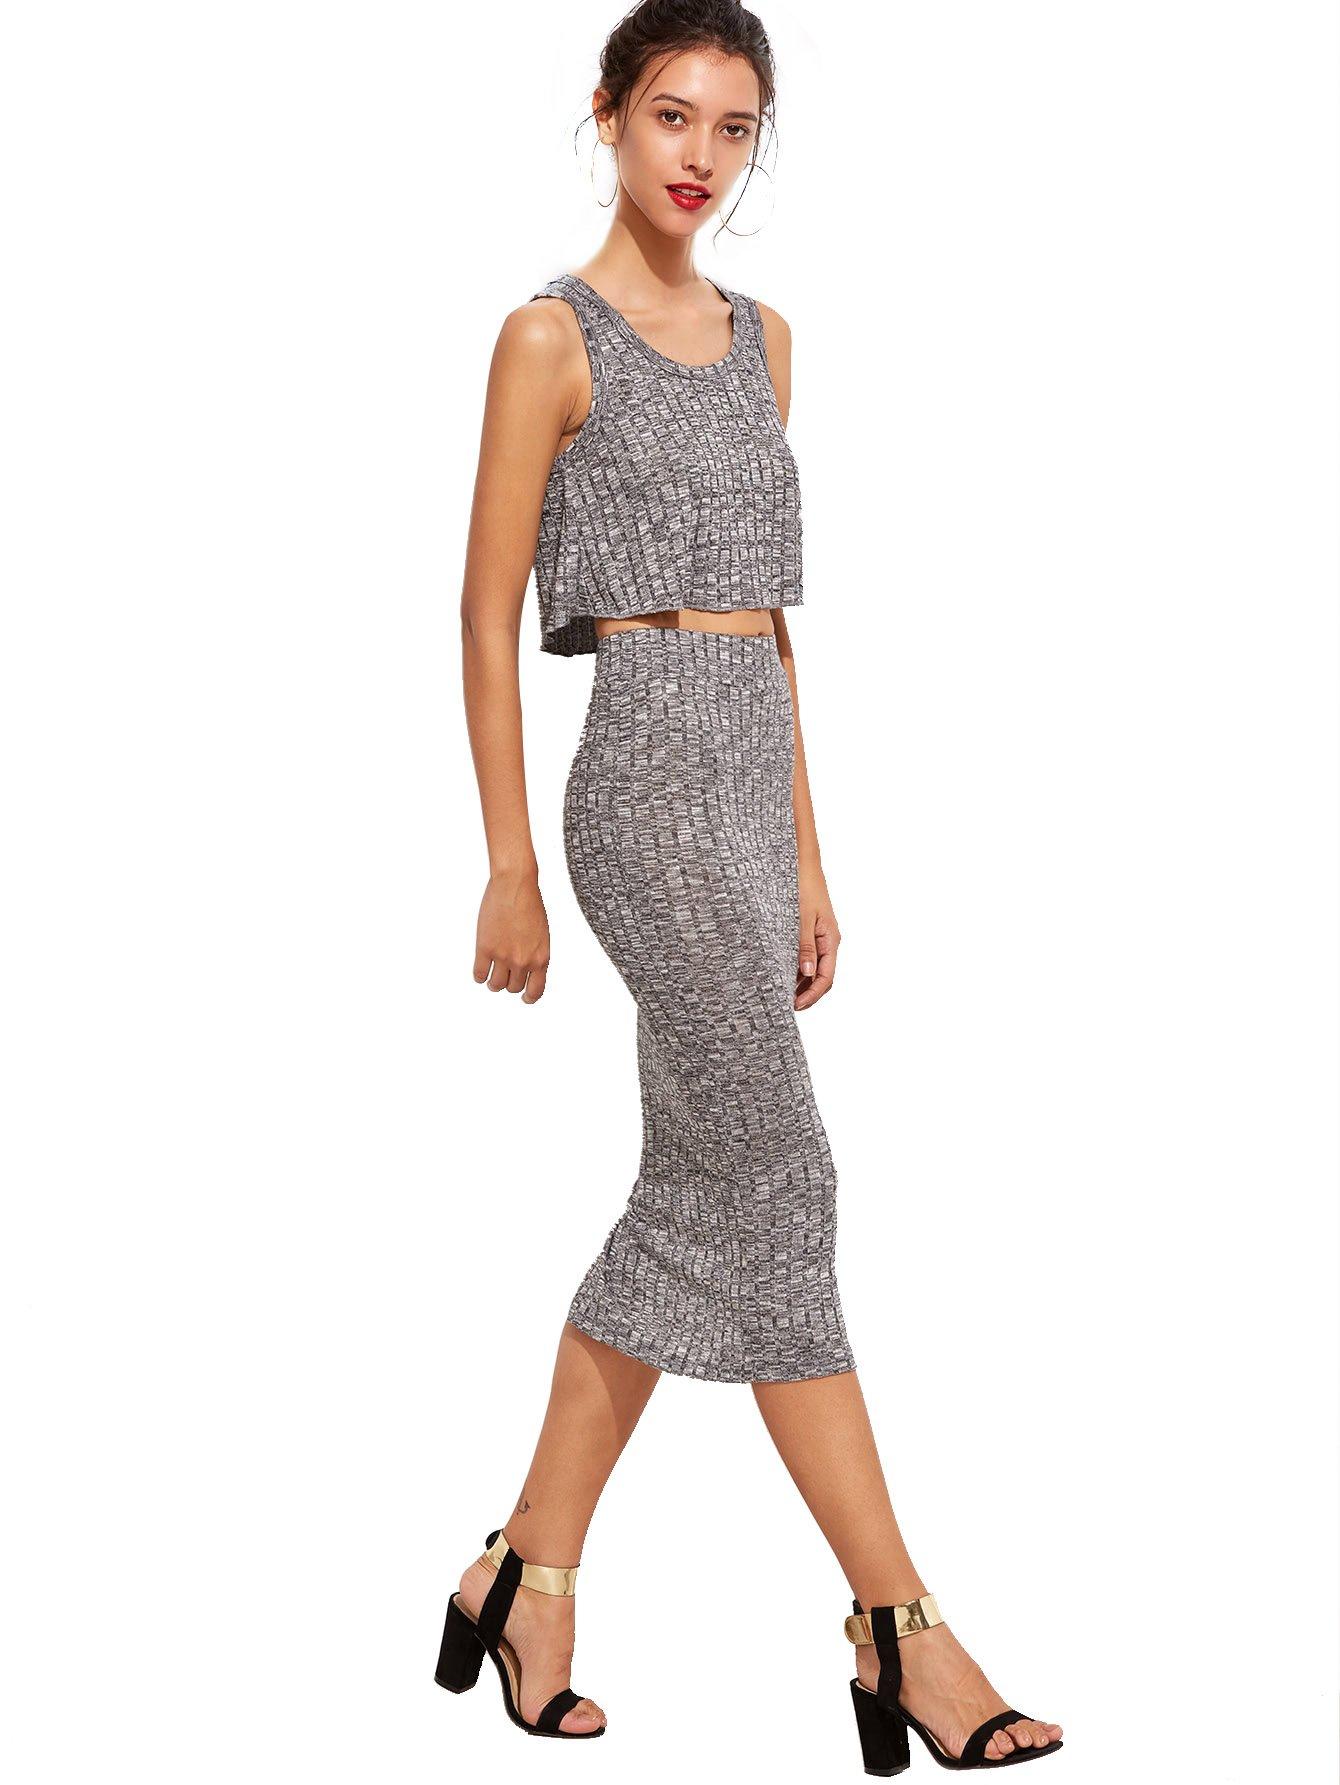 Romwe Women's 2 Piece Crop Tank Top with Skirt Set Sleeveless Bodycon Mini Dress 1-Gray Medium by Romwe (Image #3)